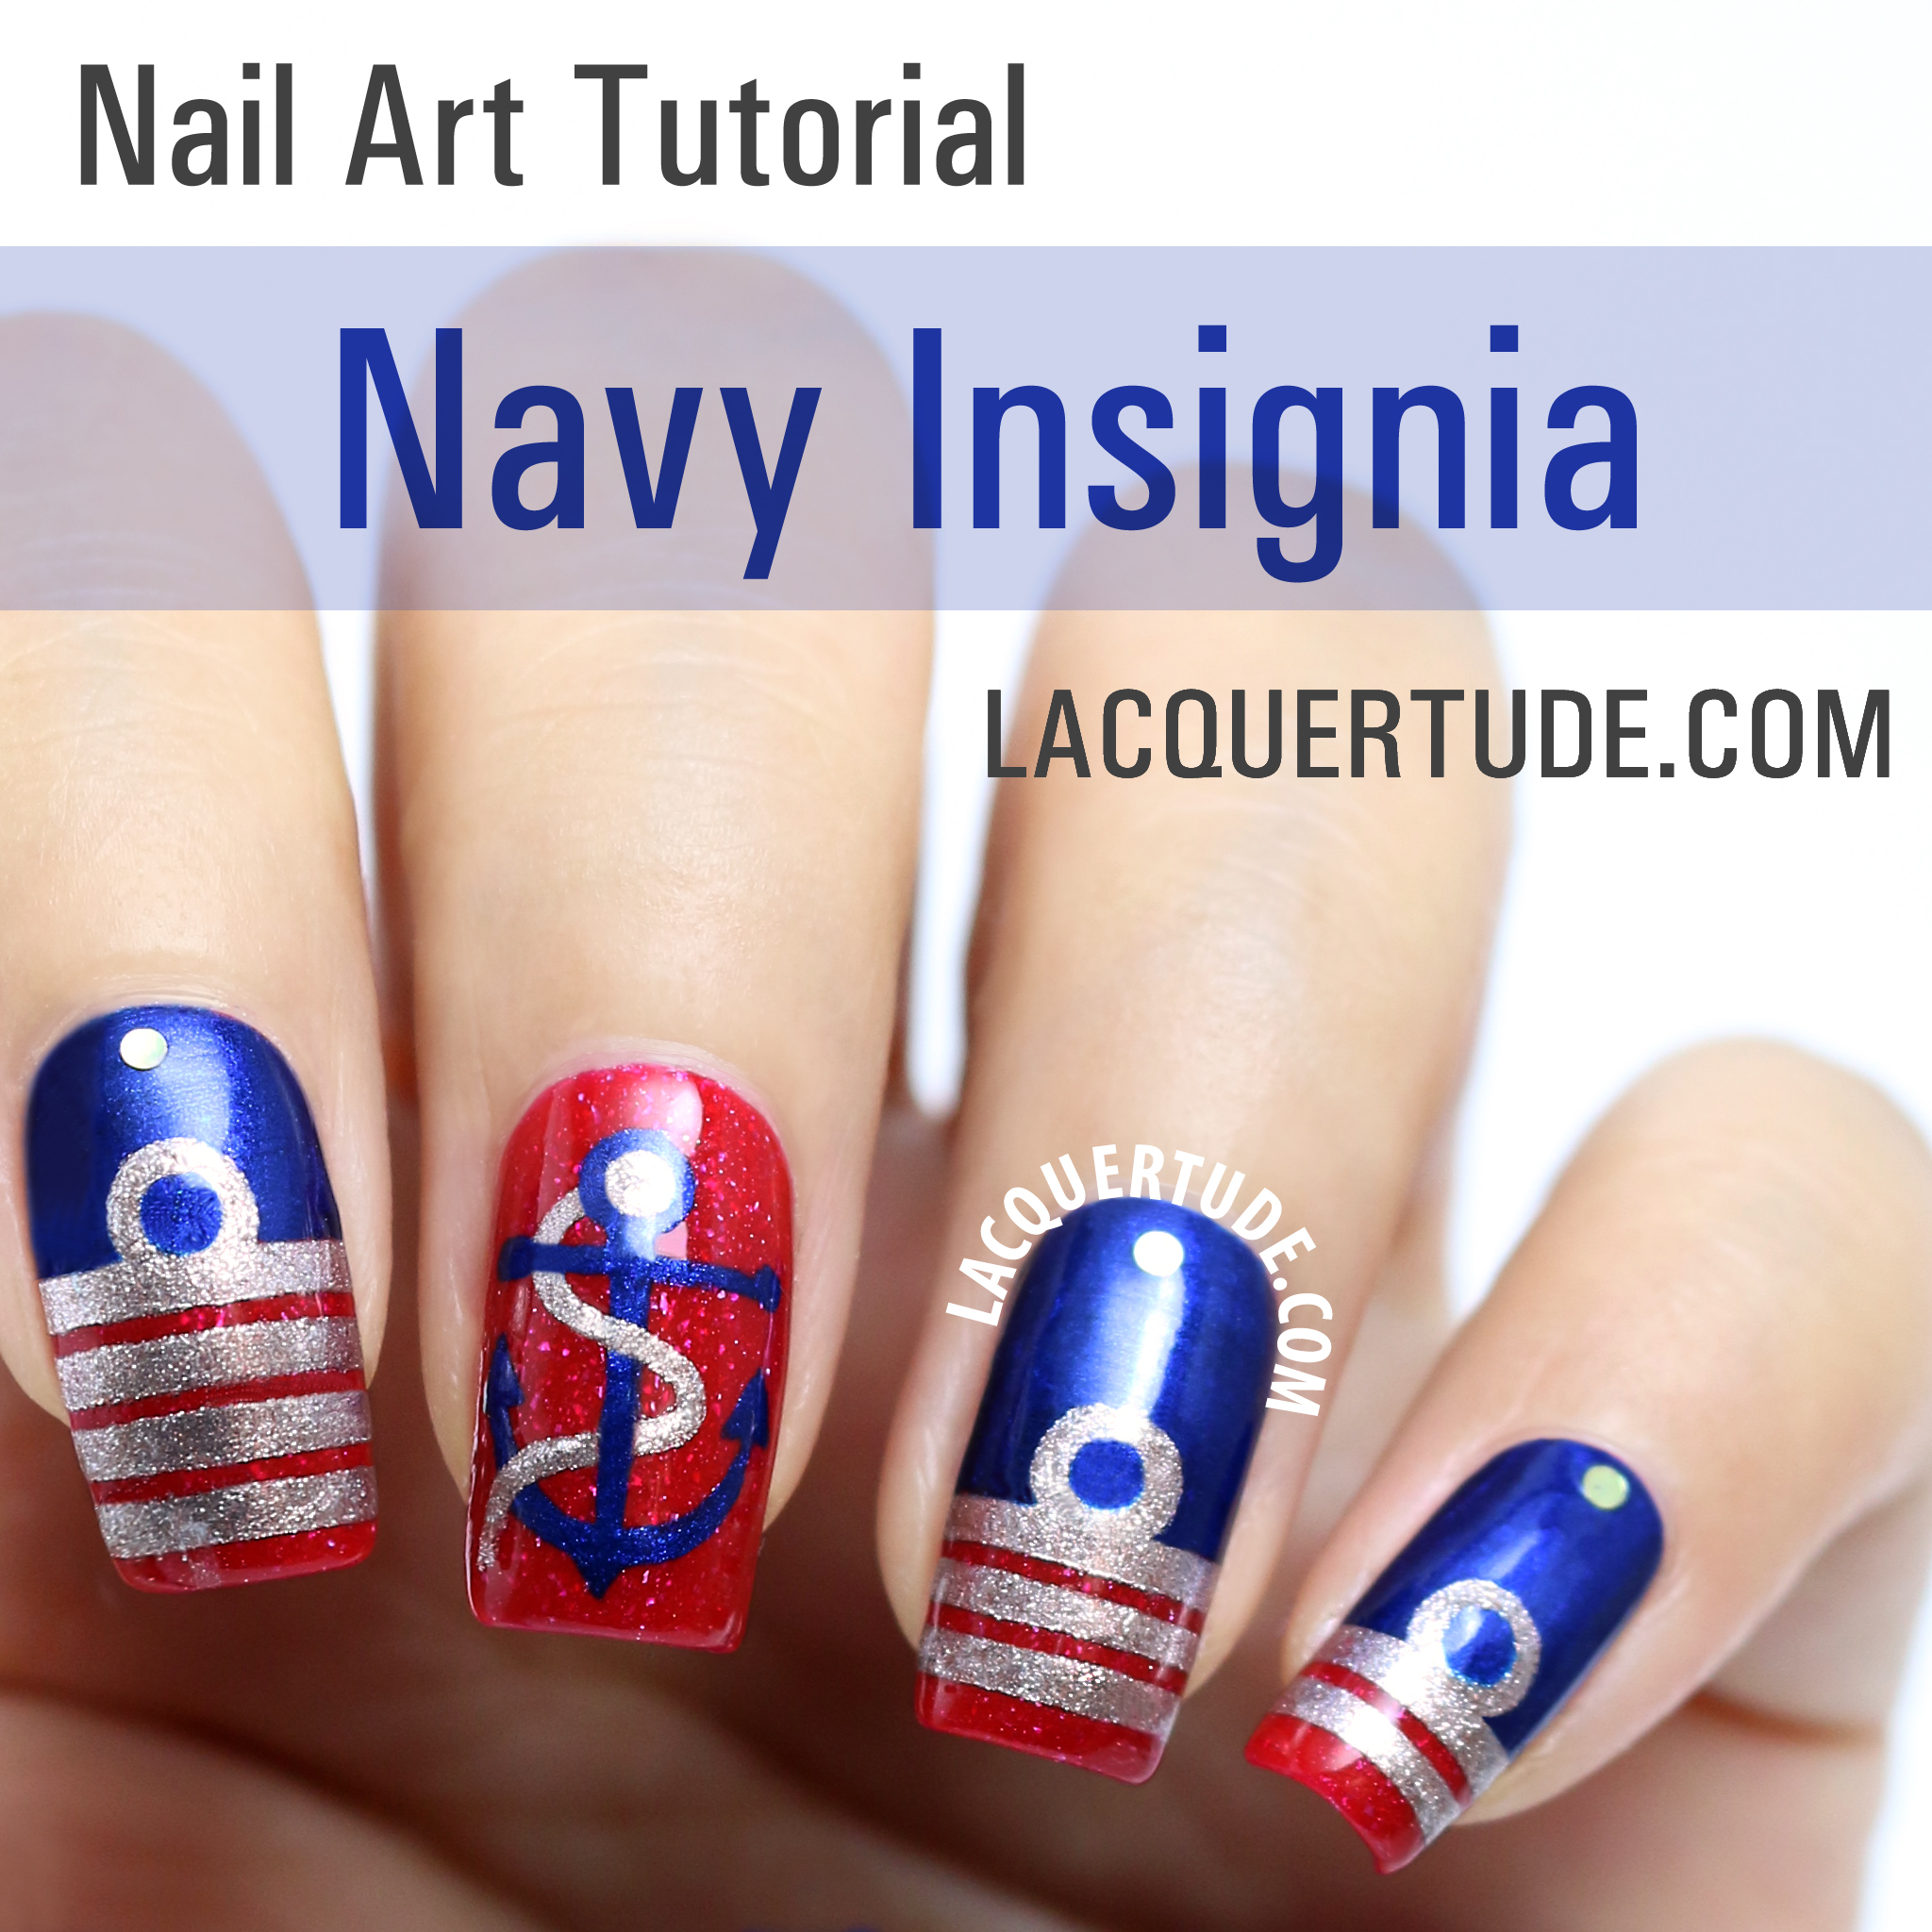 Lacquertude_Navy Insignia Tutorial